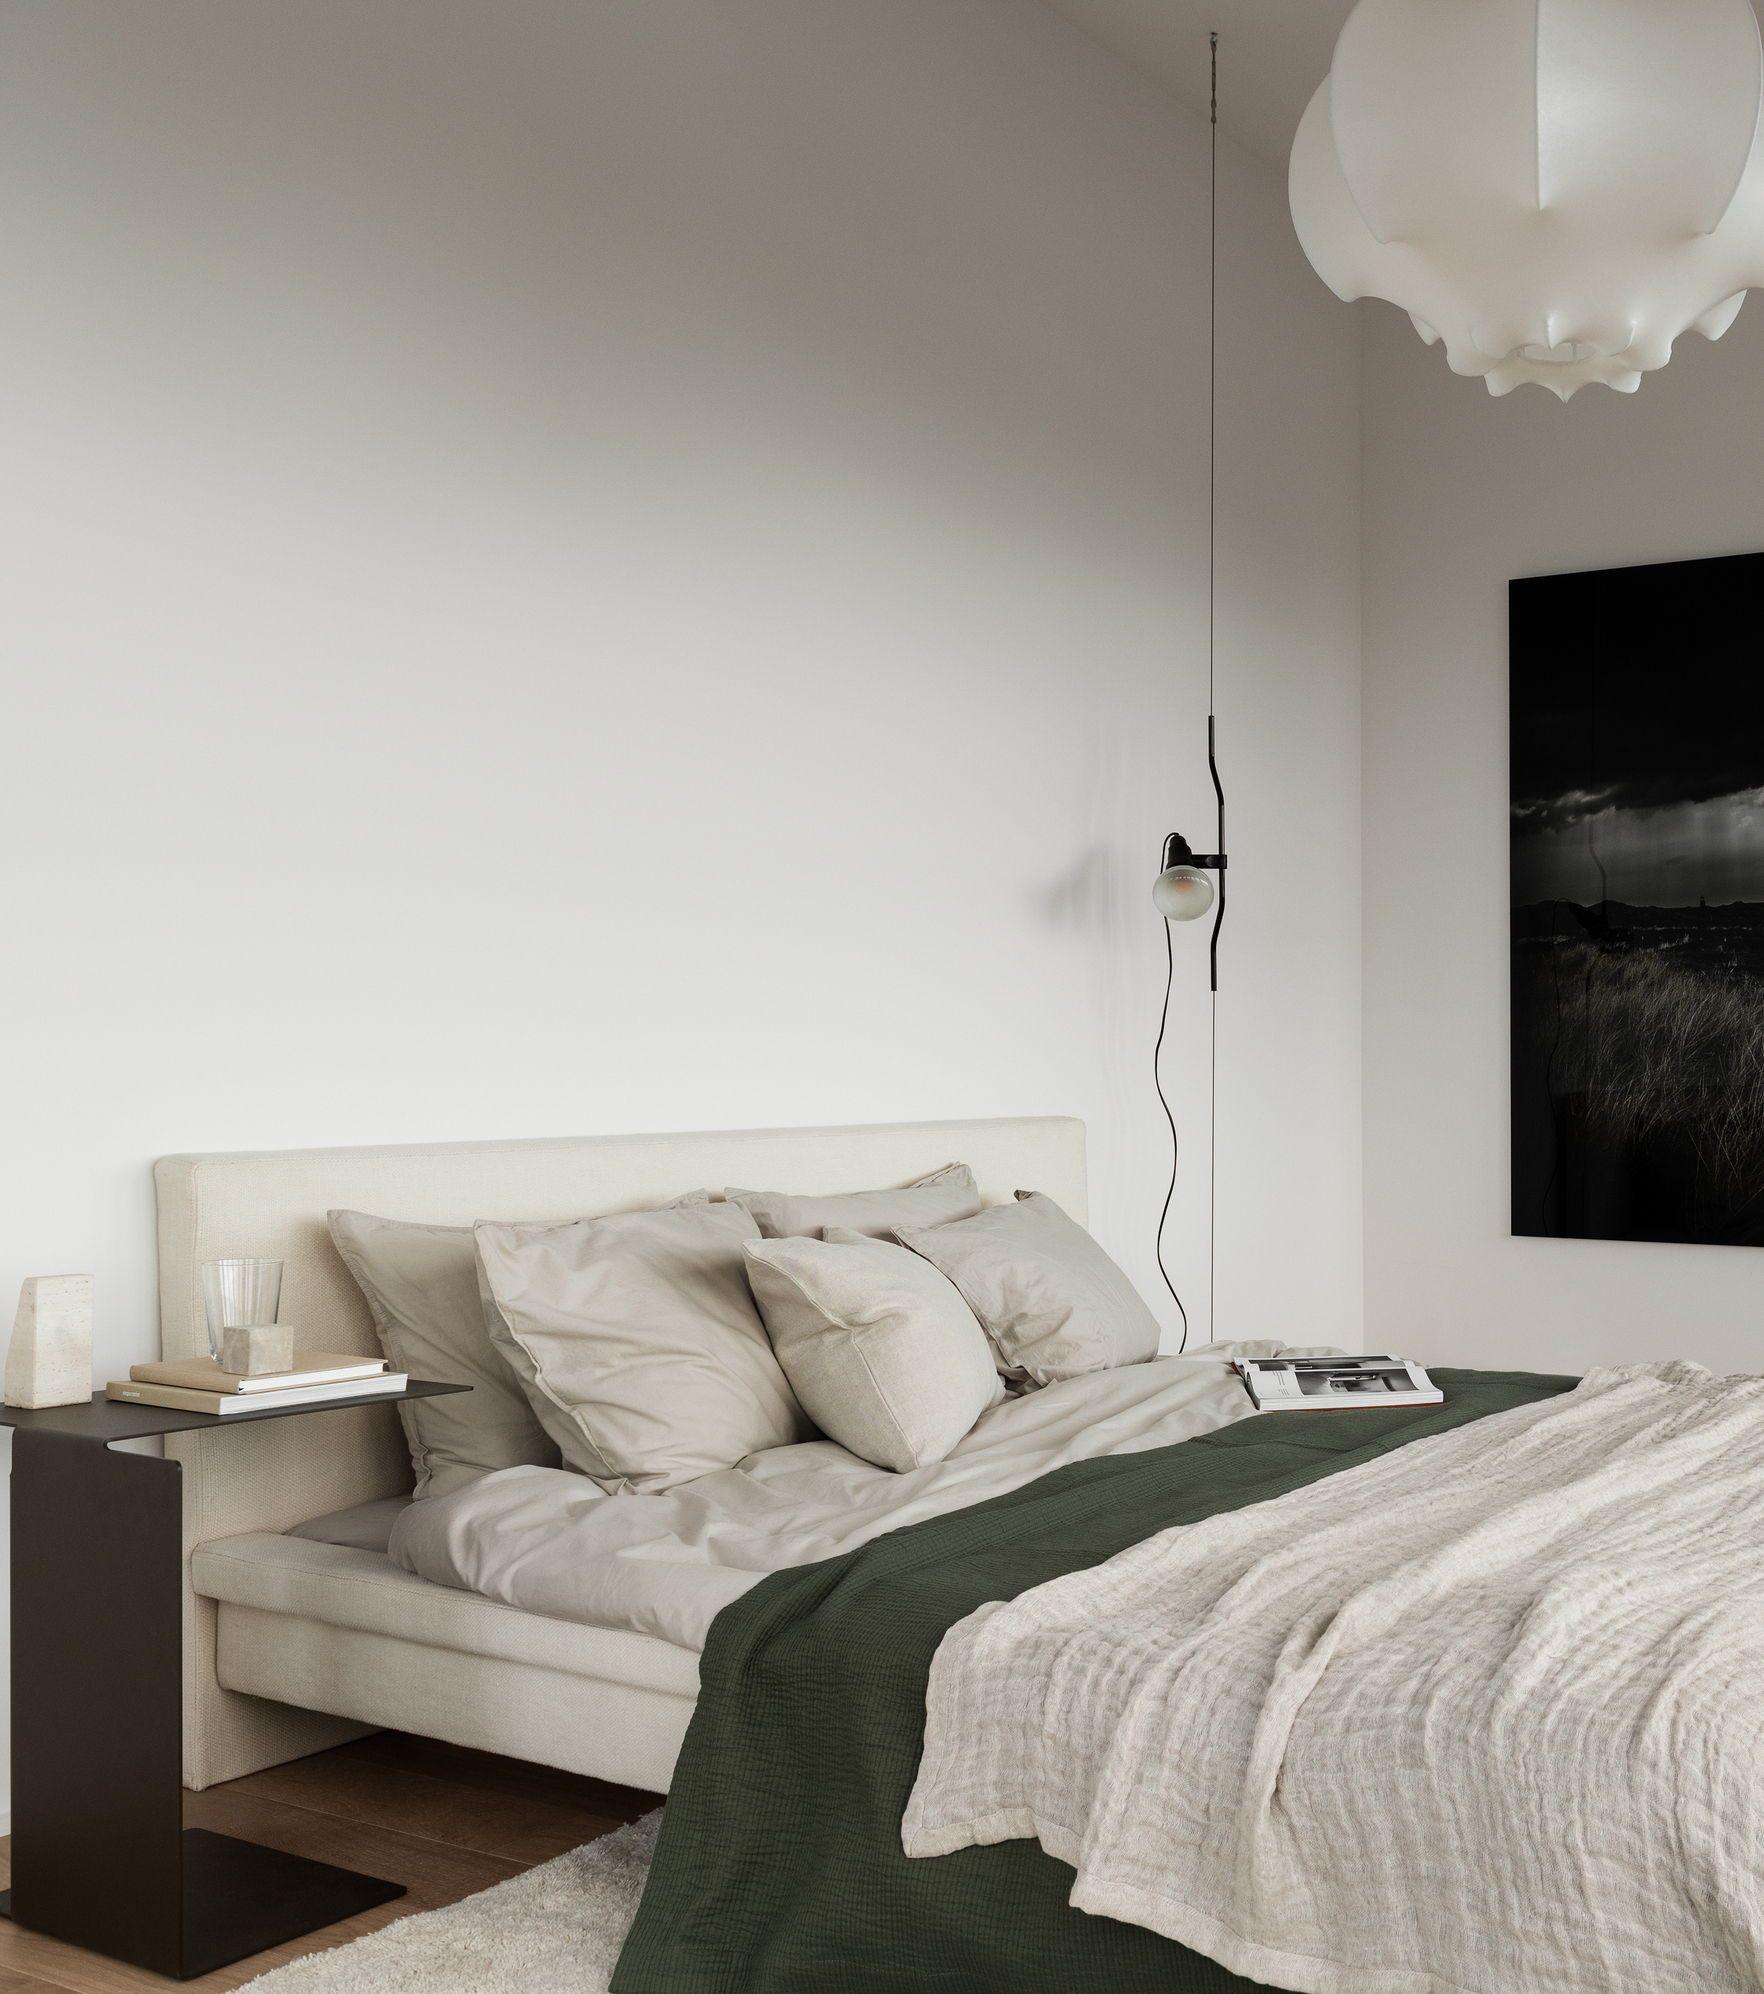 Minimal loft decor